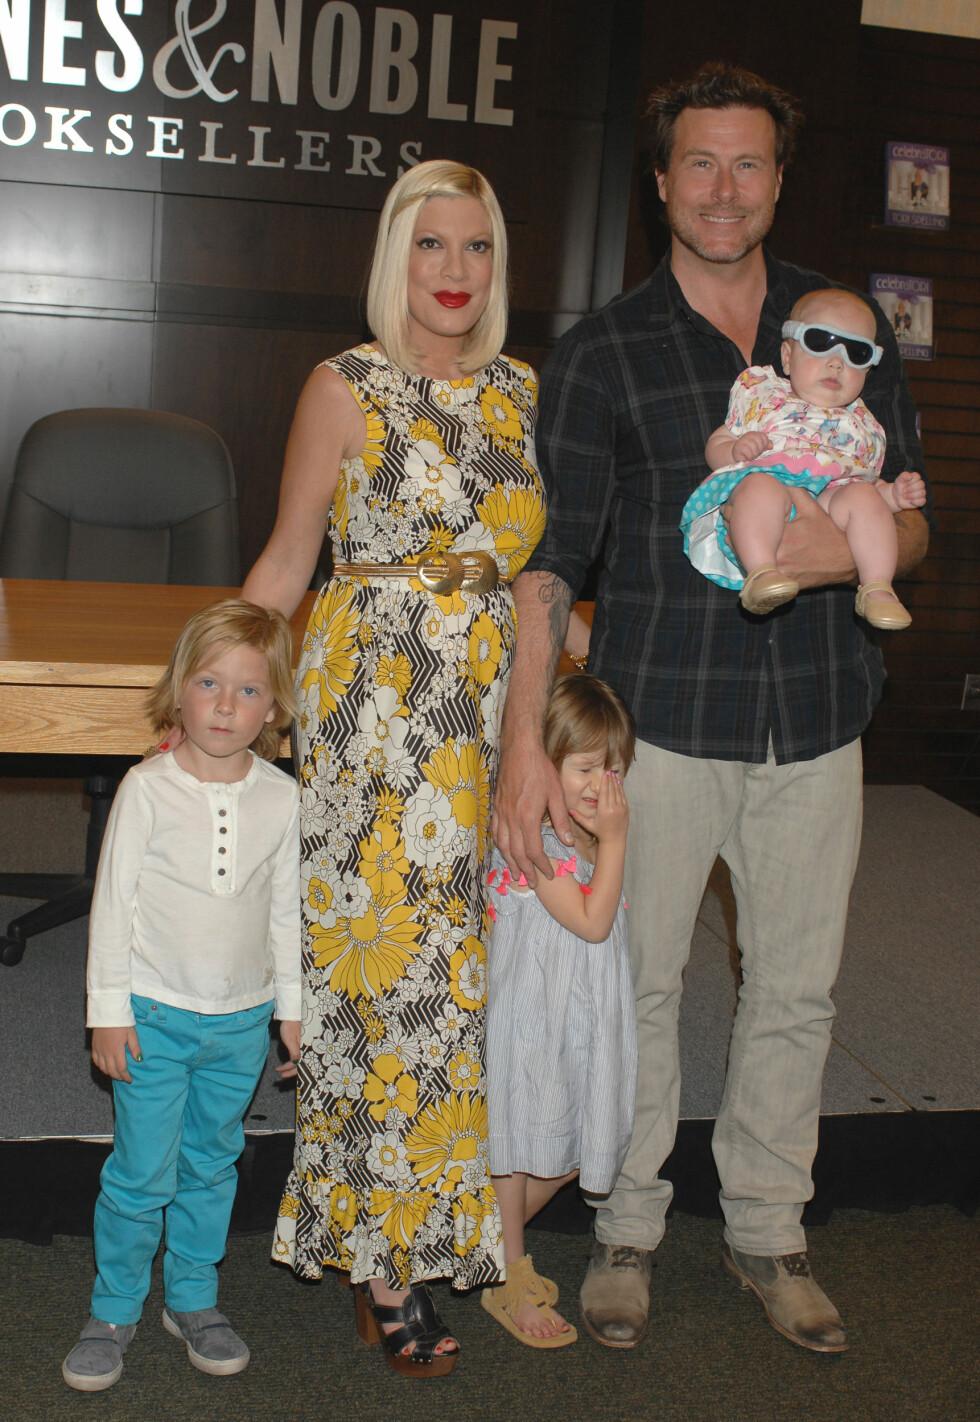 FIRE BARN: Paret har barna Liam (7), Stella (6), Hattie (3) og Finn (2) sammen. Foto: Stella Pictures